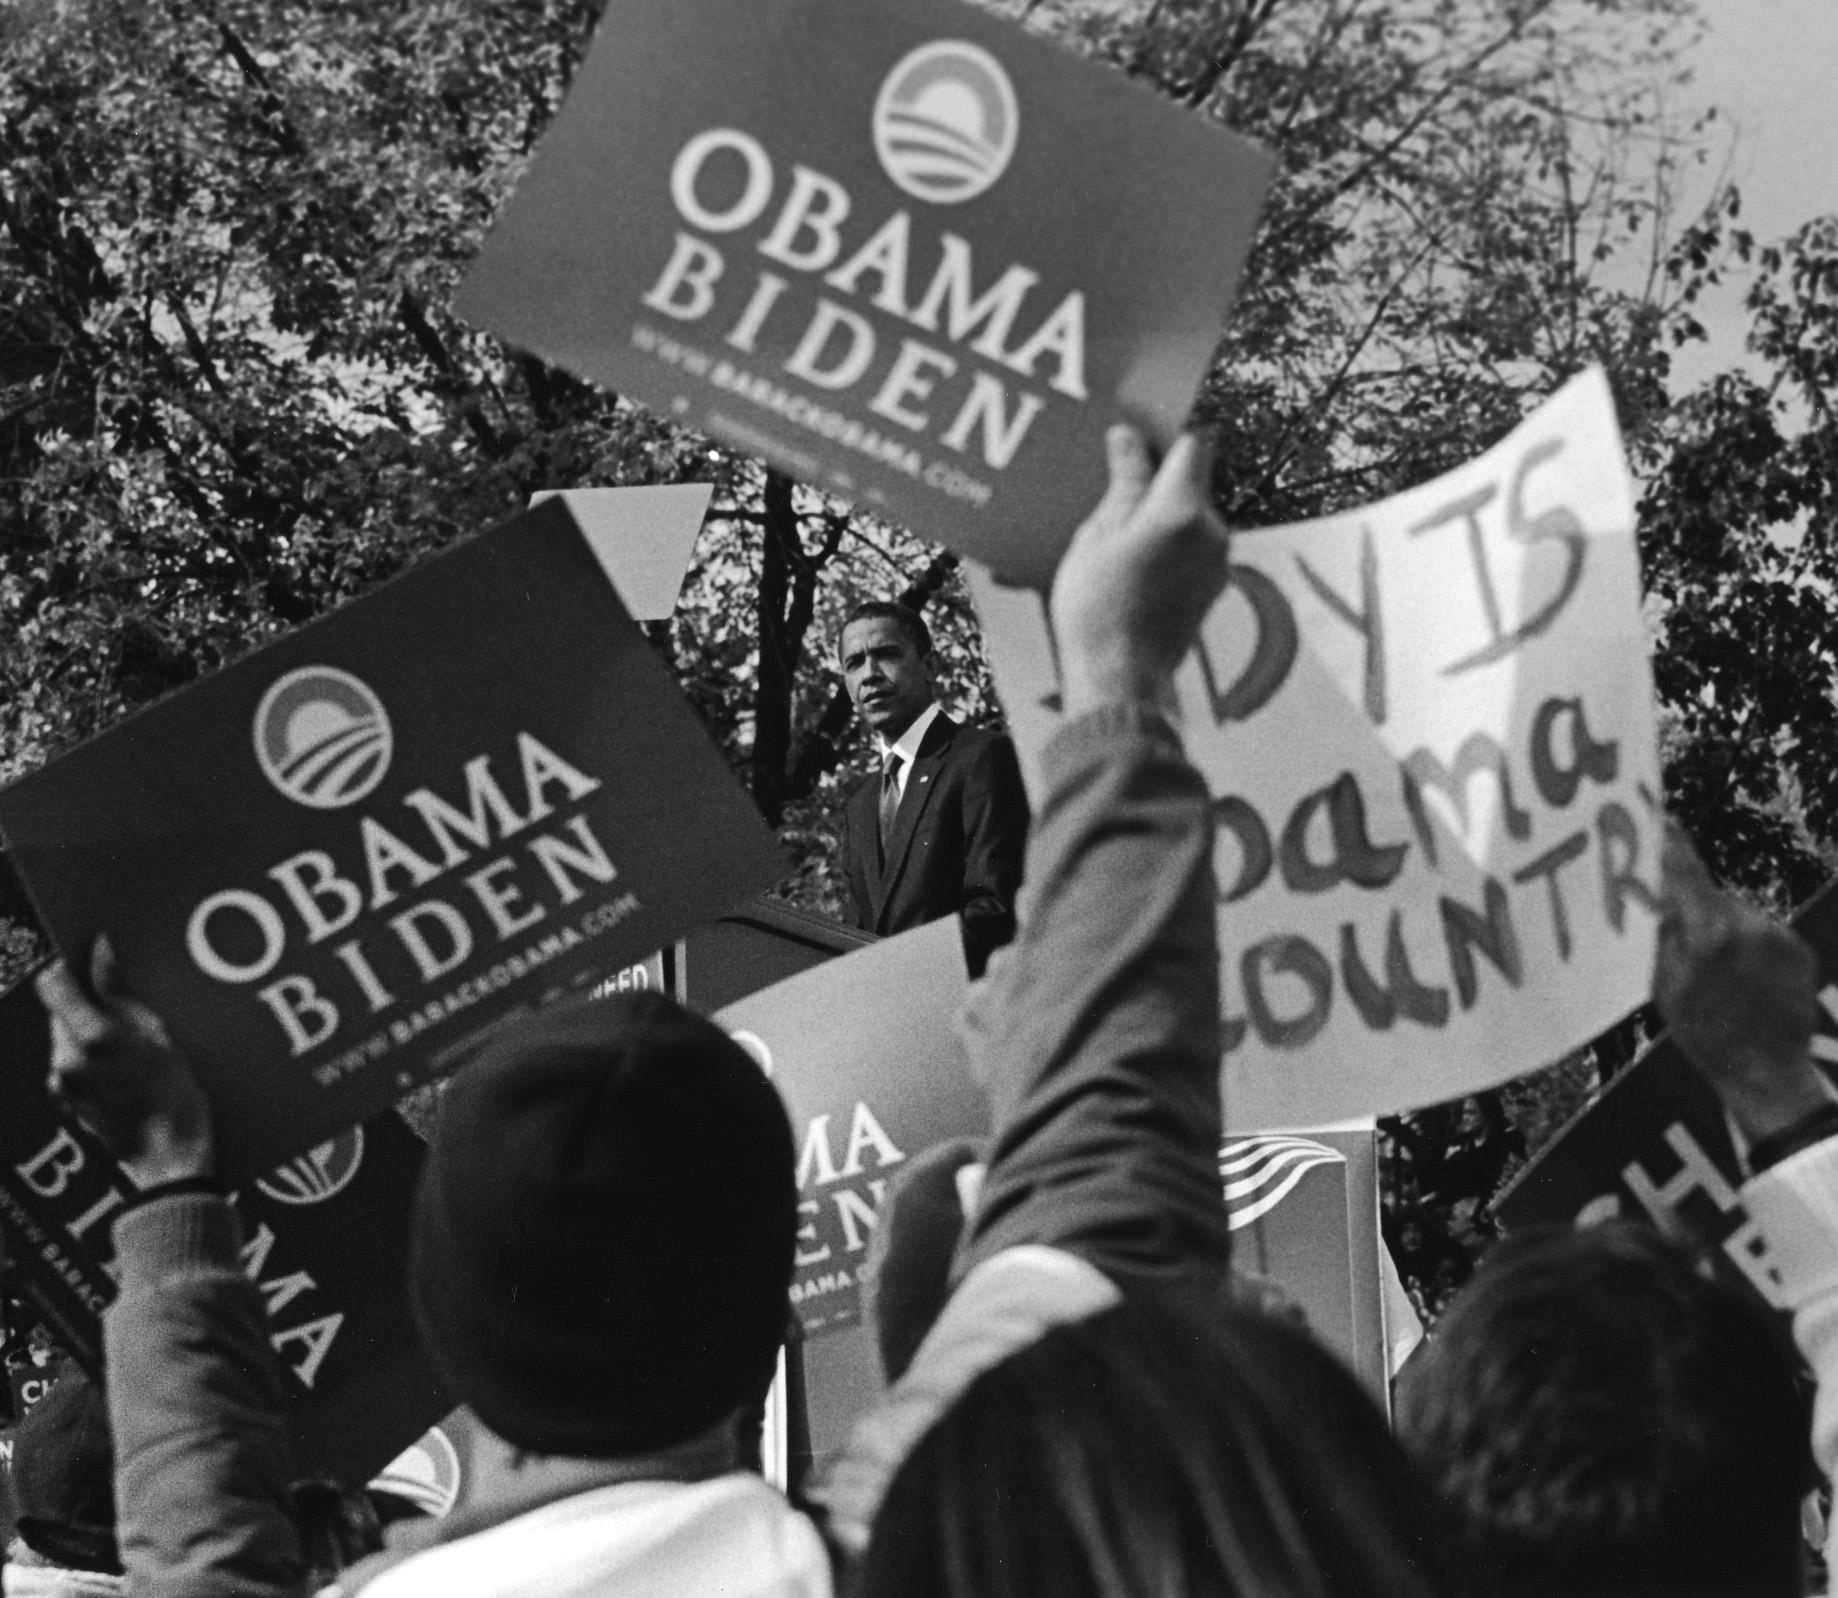 Candidate Obama